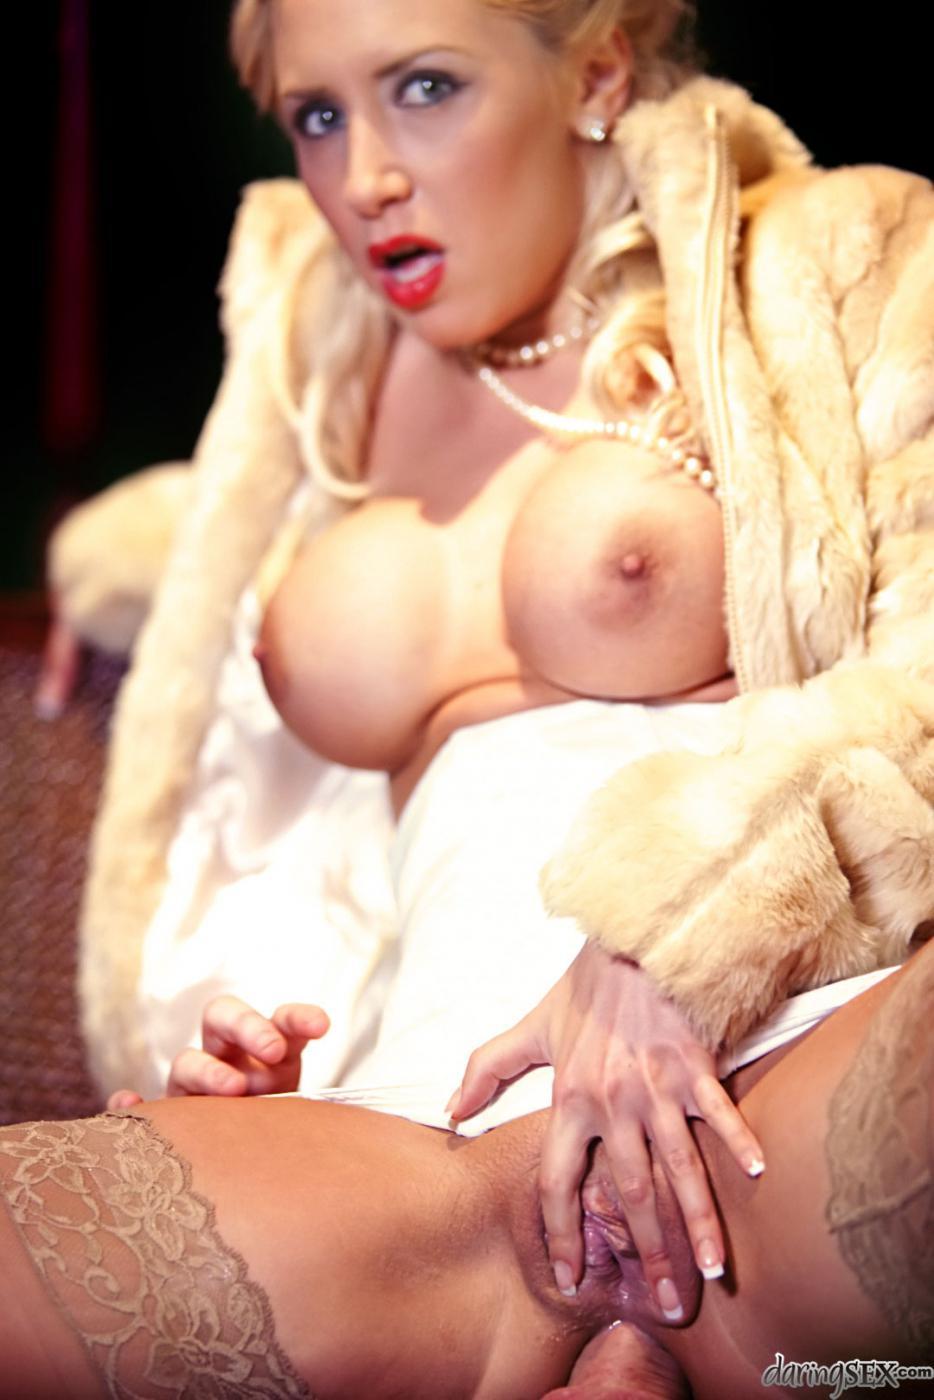 hot greek women nude pics